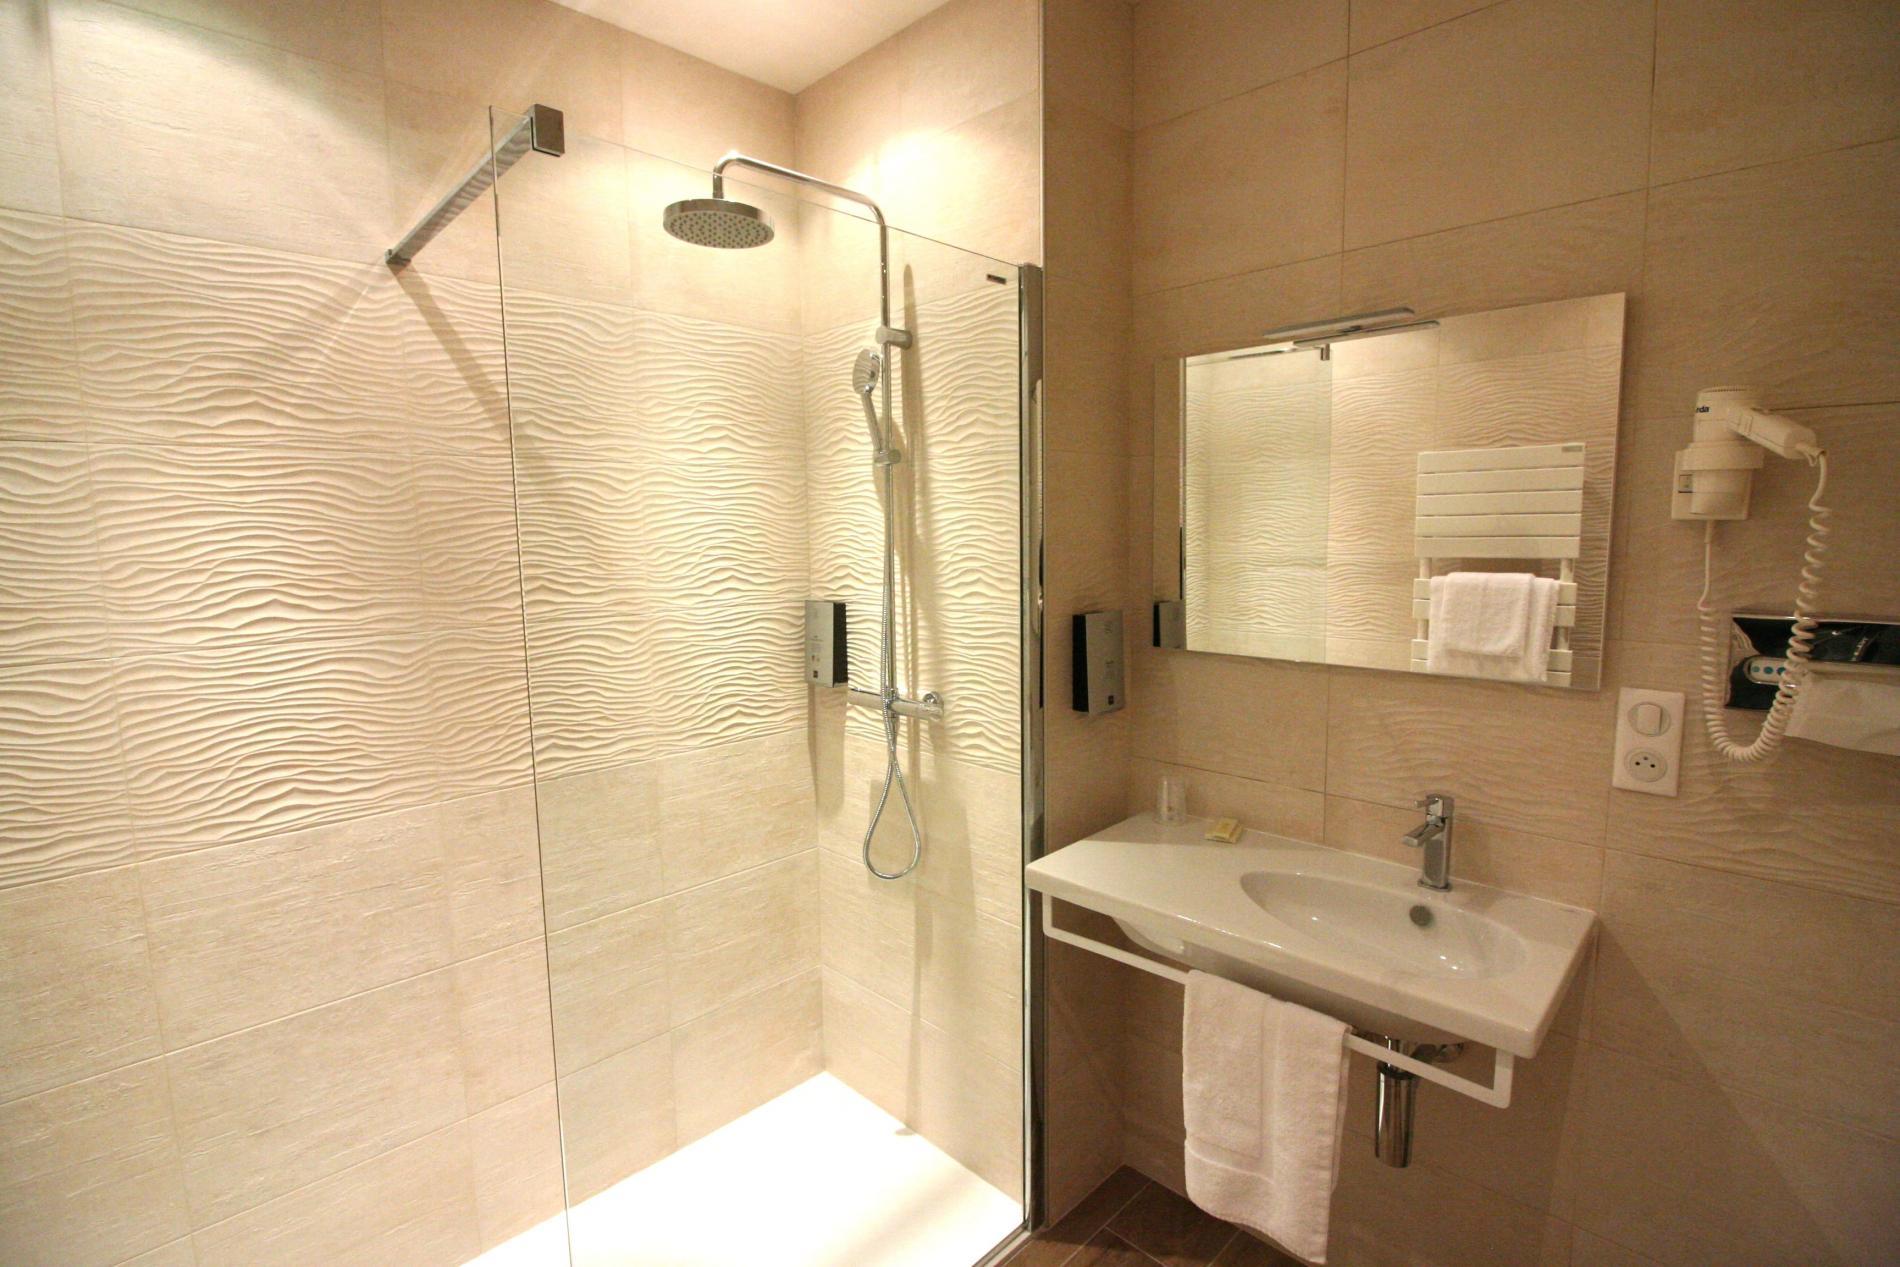 Salles De Bains Bruxelles ~ chambre de l hotel mortagne au perche orne proche alen on